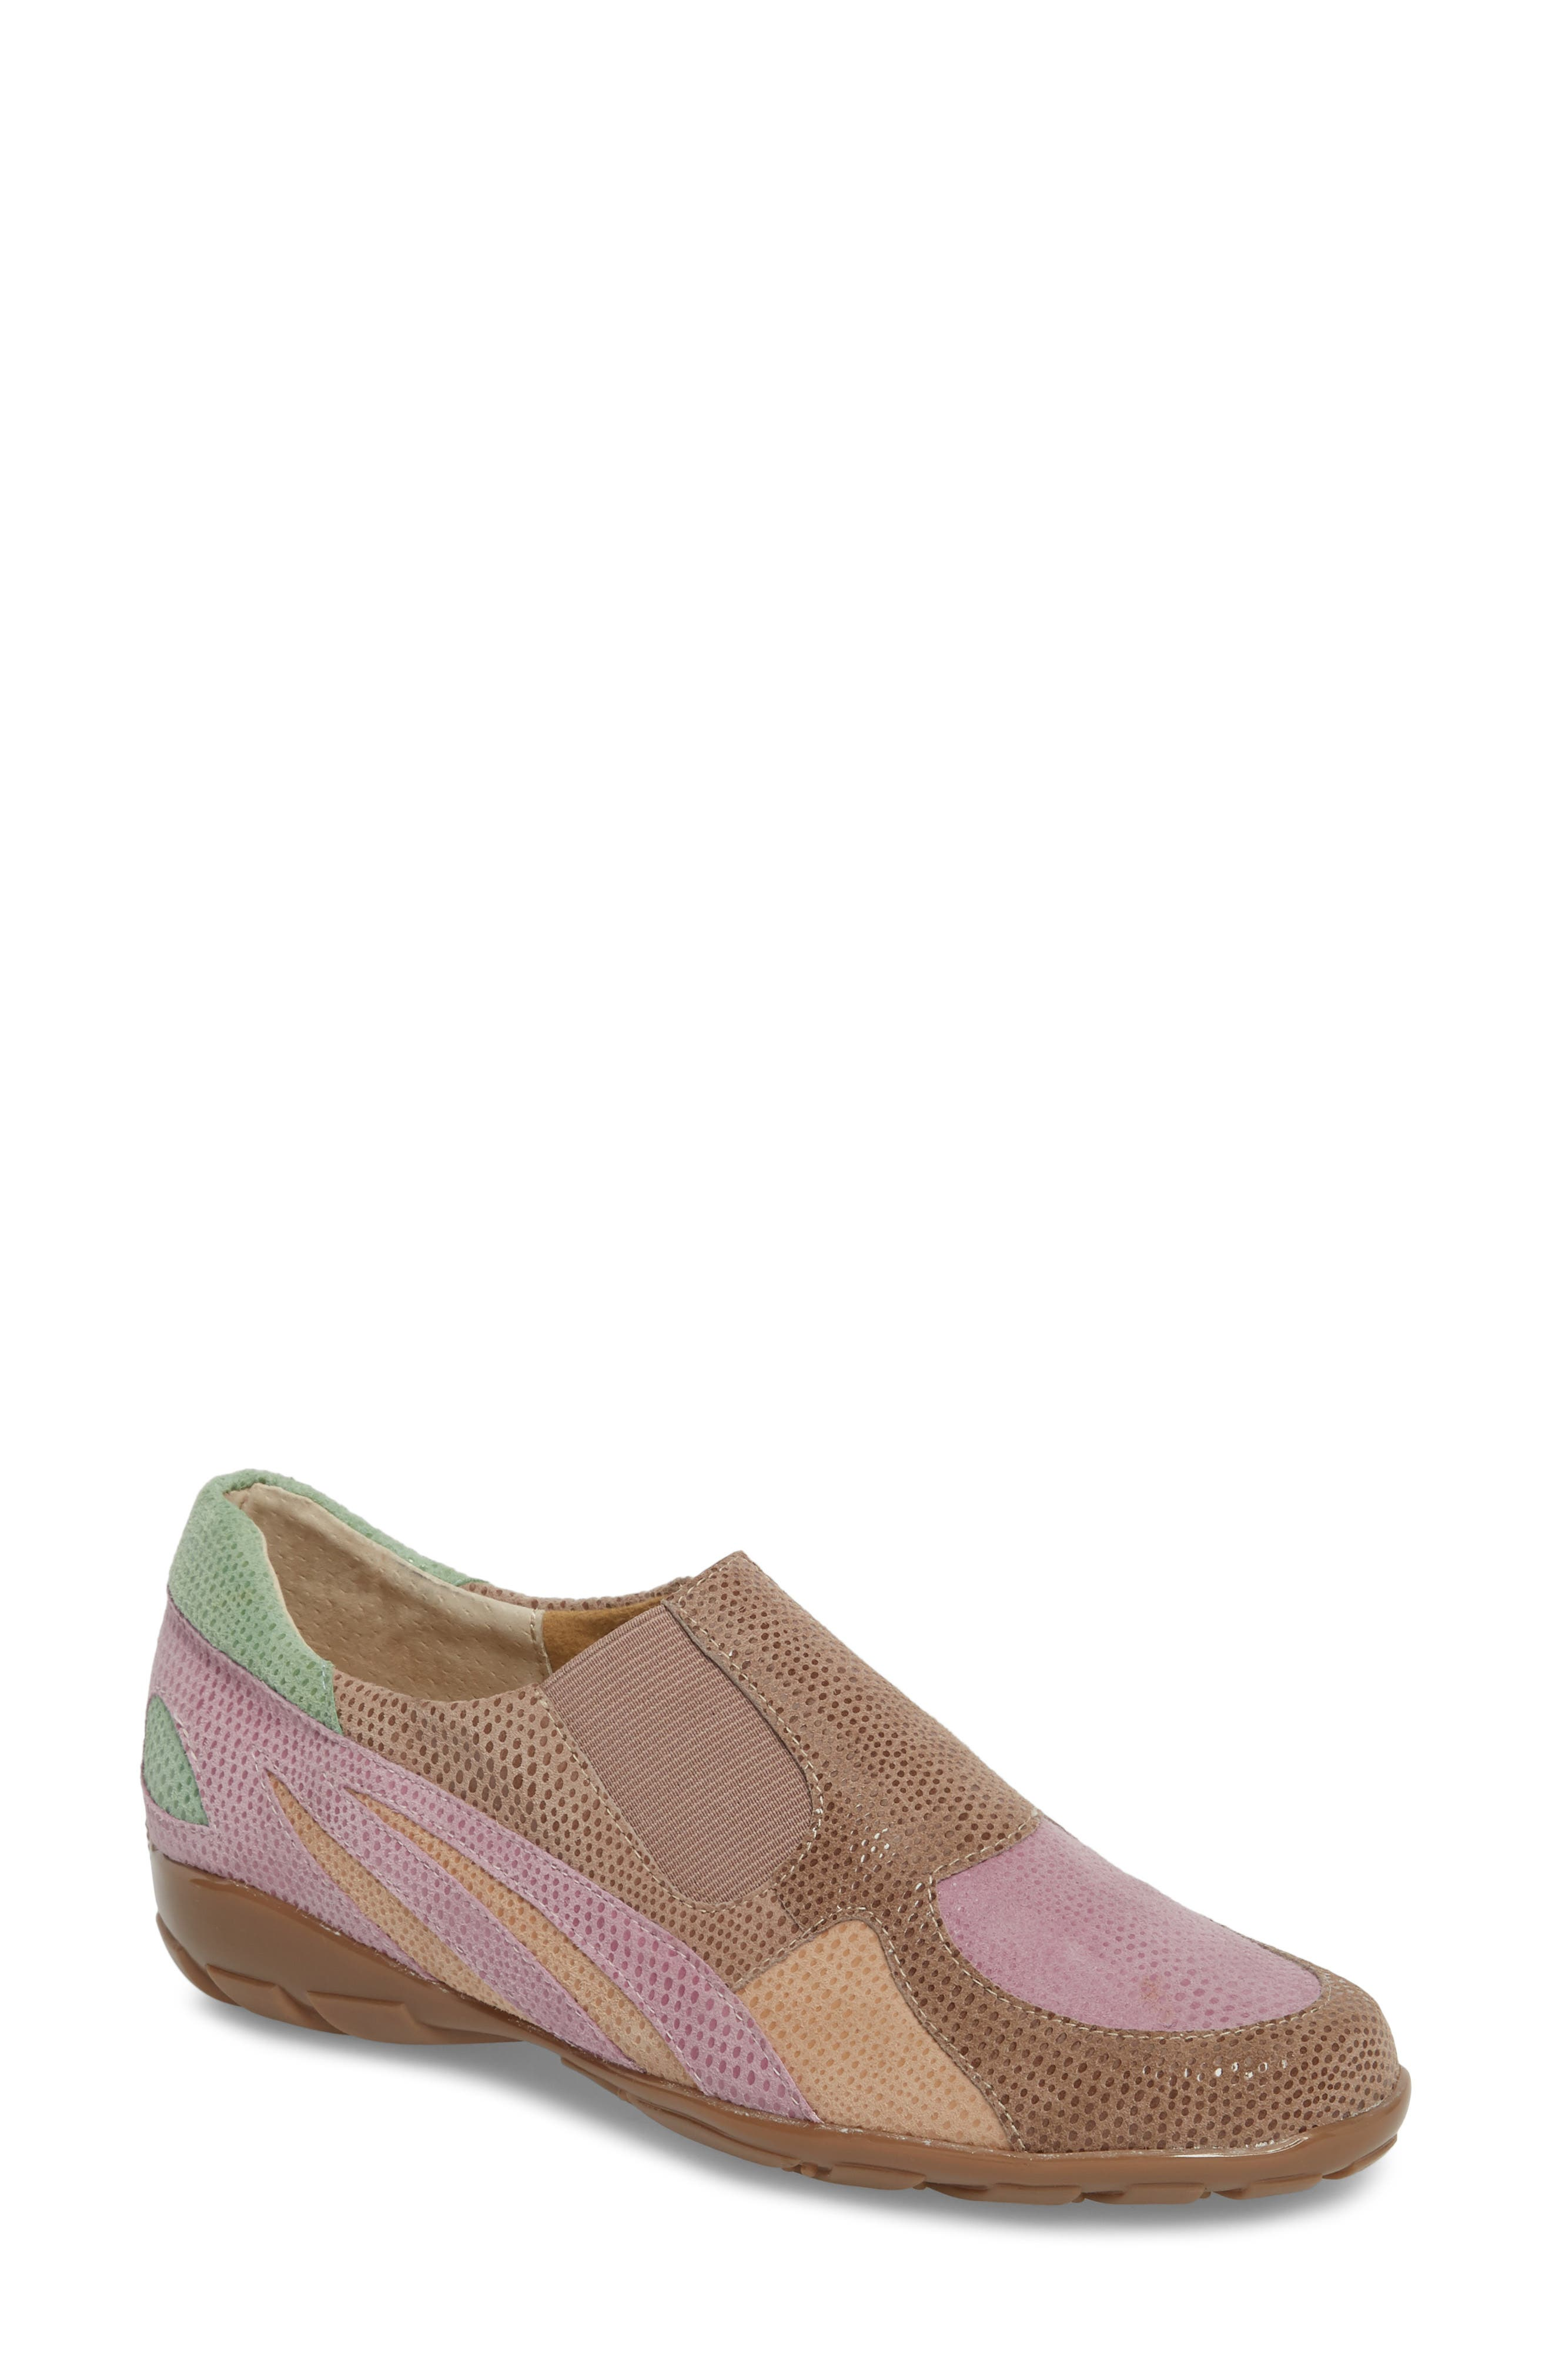 'Attie' Colorblock Slip-On Flat,                         Main,                         color, Wisteria Printed Suede